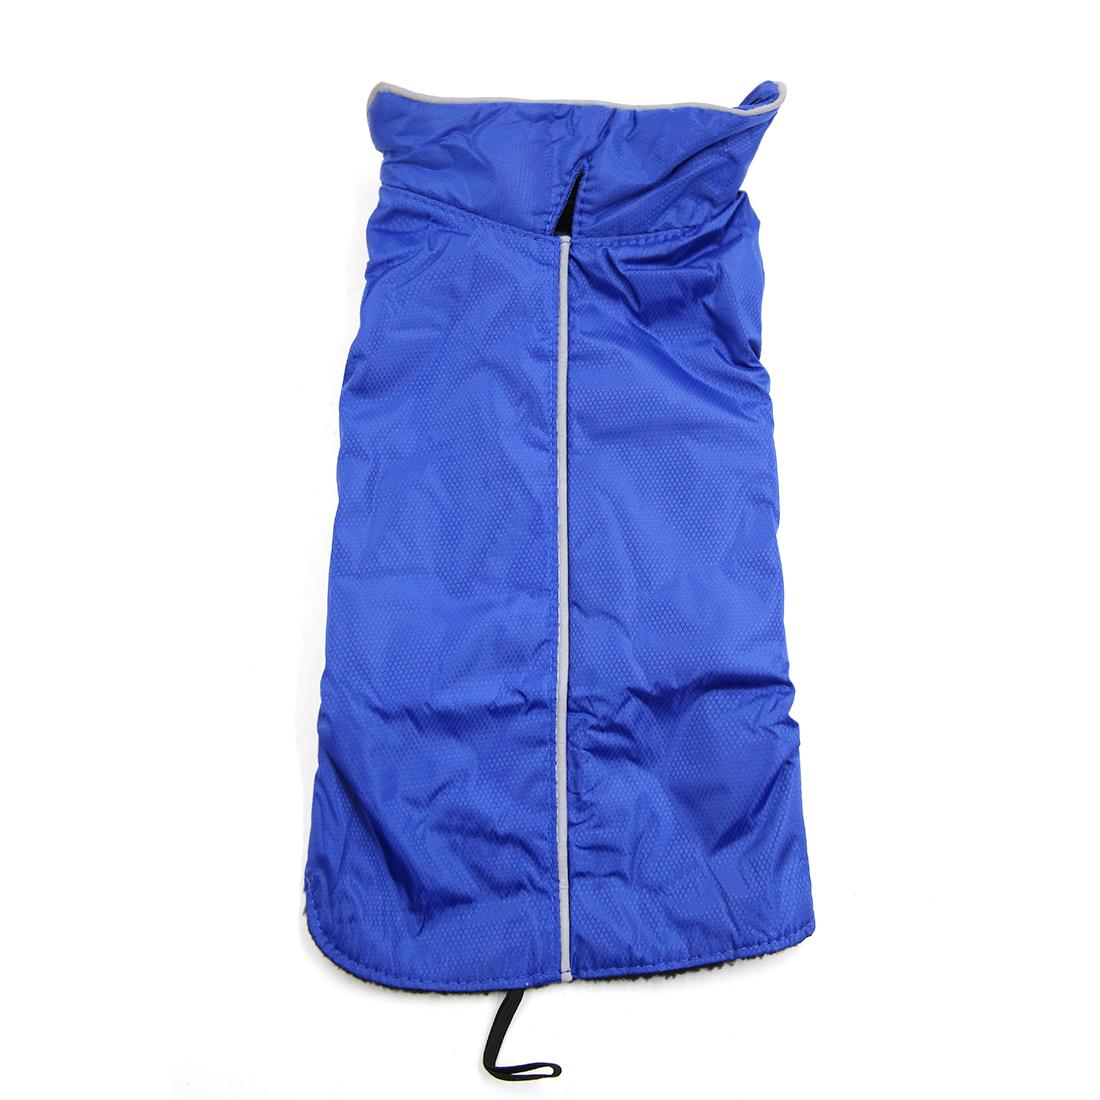 Reflective Vest Jacket Clothes Soft Warm Fleece Lining Dog Coat Clothing Blue L